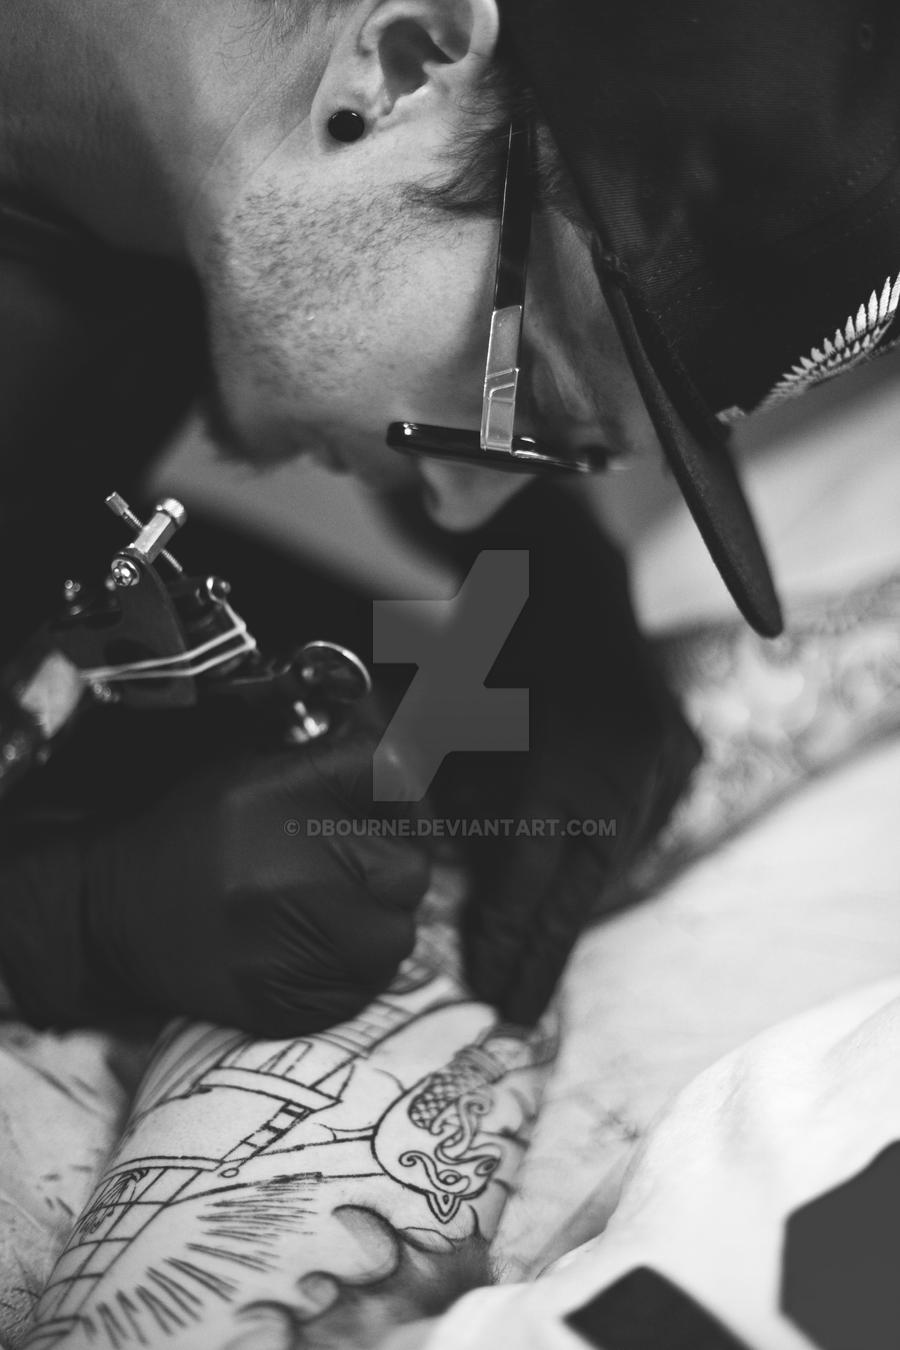 Tatts by DBourne